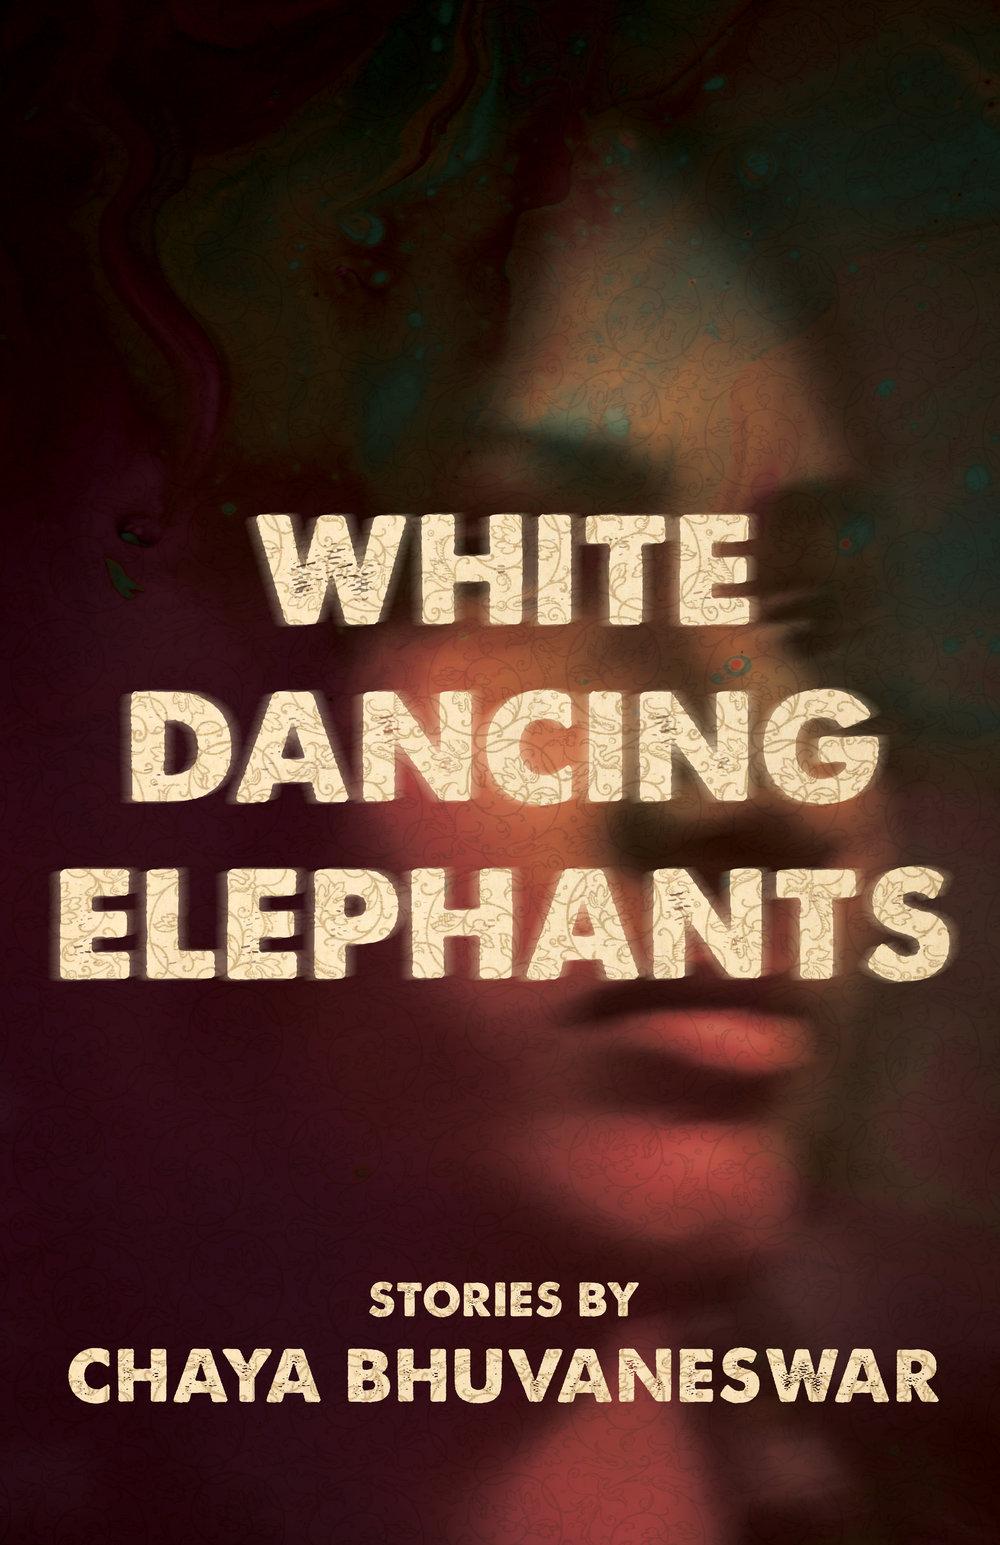 White Dancing Elephants cover high res (1).jpg